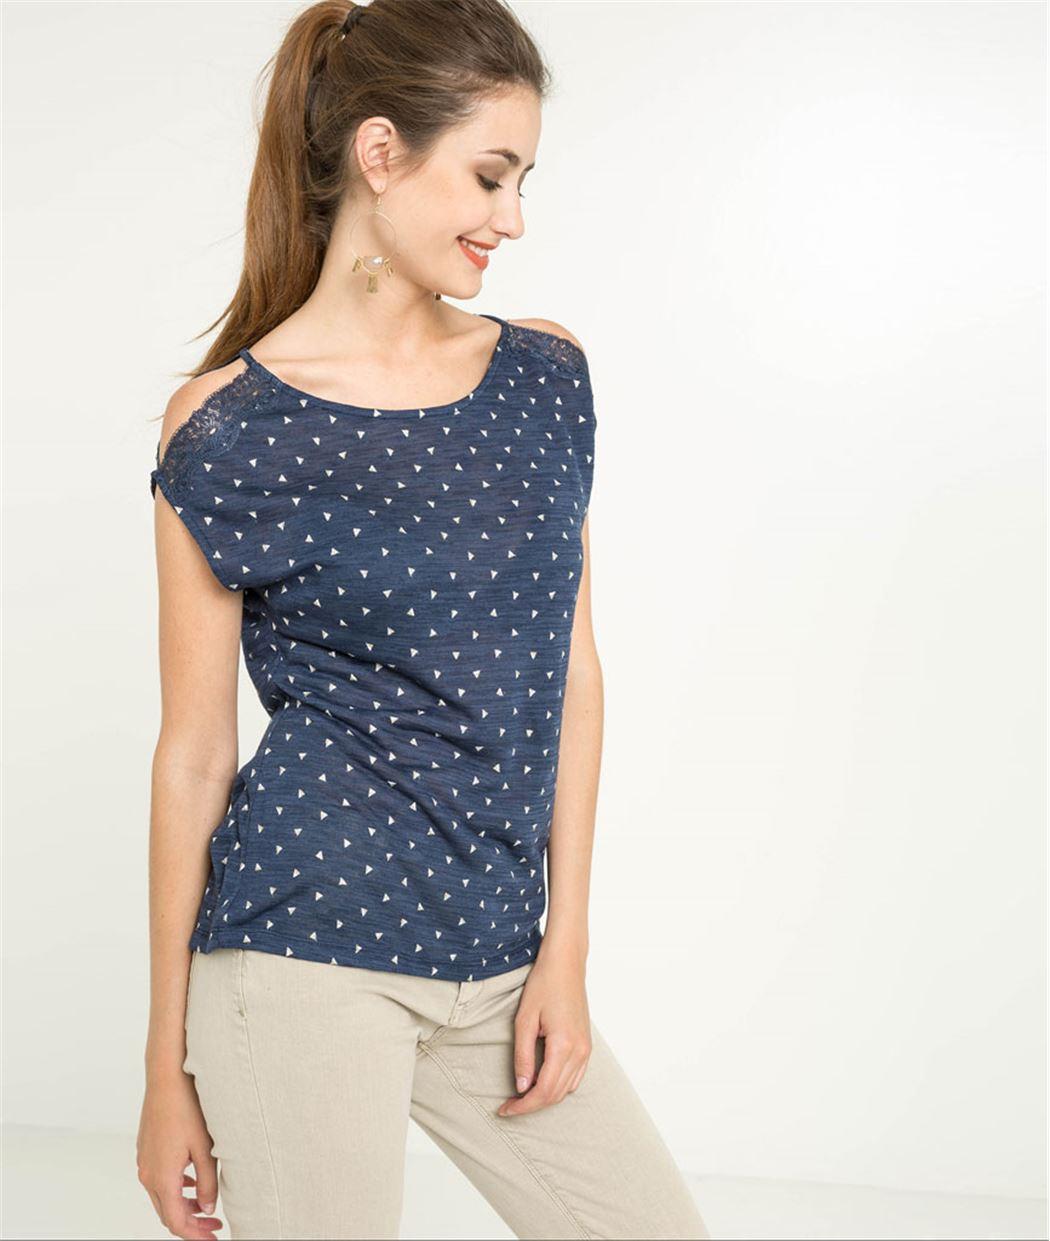 T-shirt femme épaules ouvertes dentelle MARINE